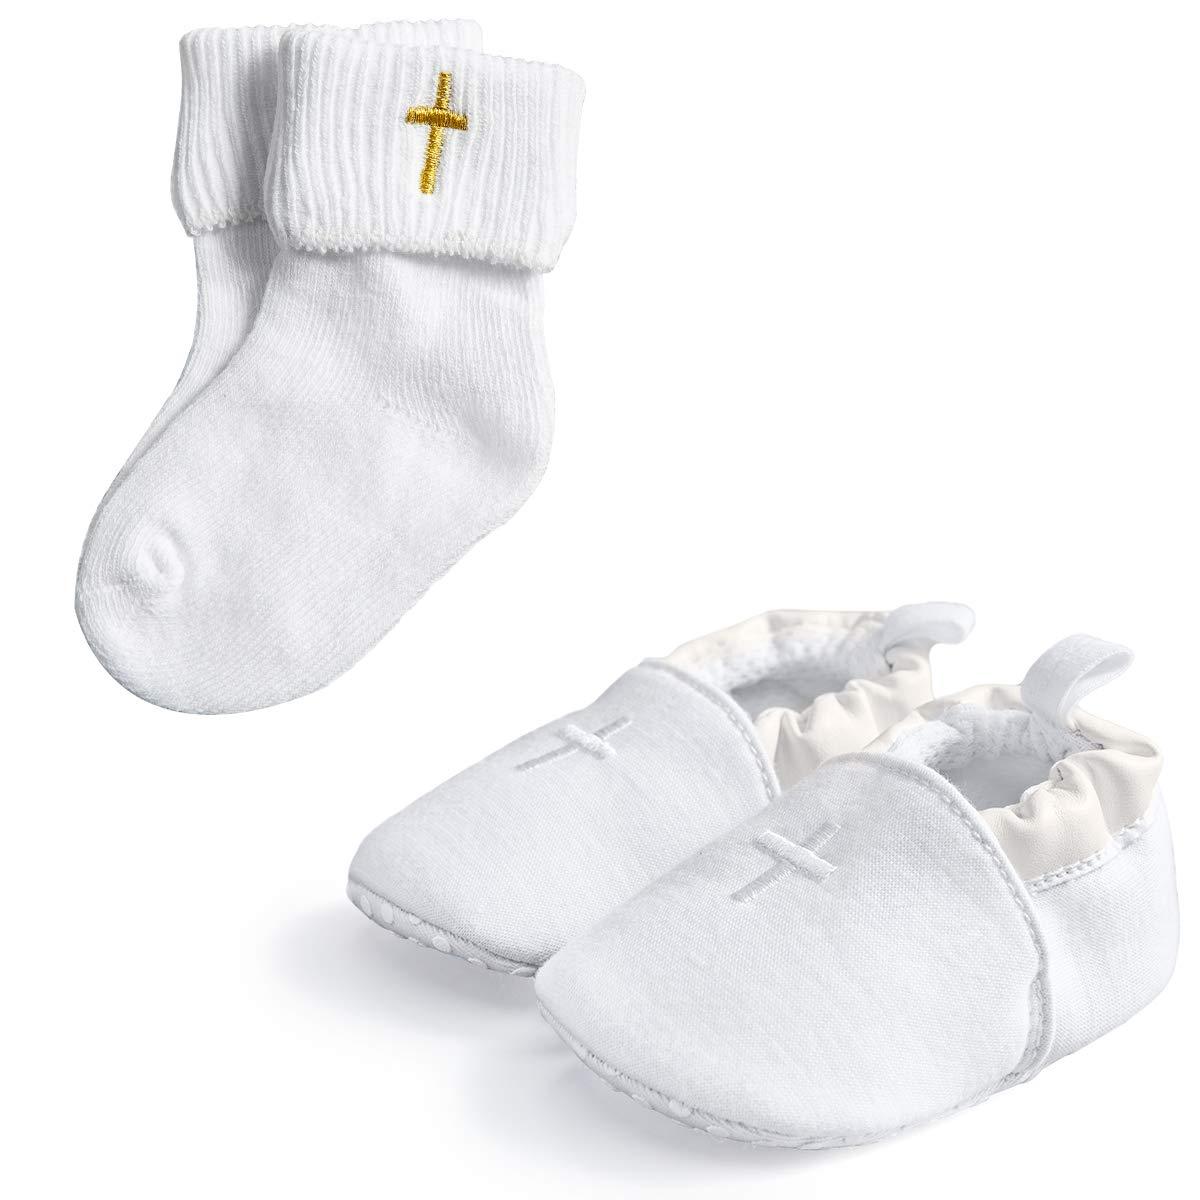 HAPIU Baby Baptism Cross Shoes with White Baptism Cross Socks,2 Pack,6-12M